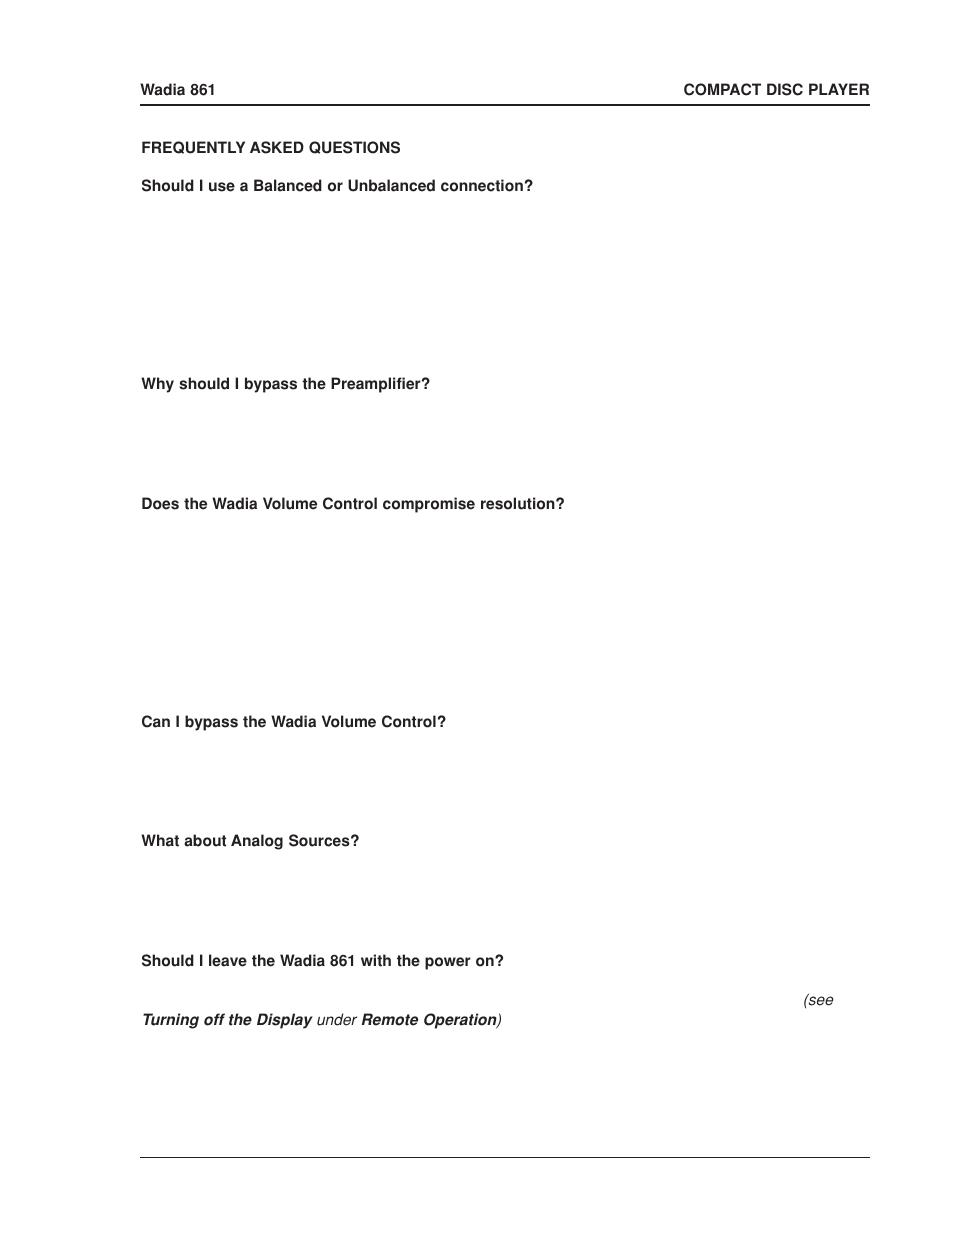 Wadia Digital 861 User Manual | Page 7 / 21